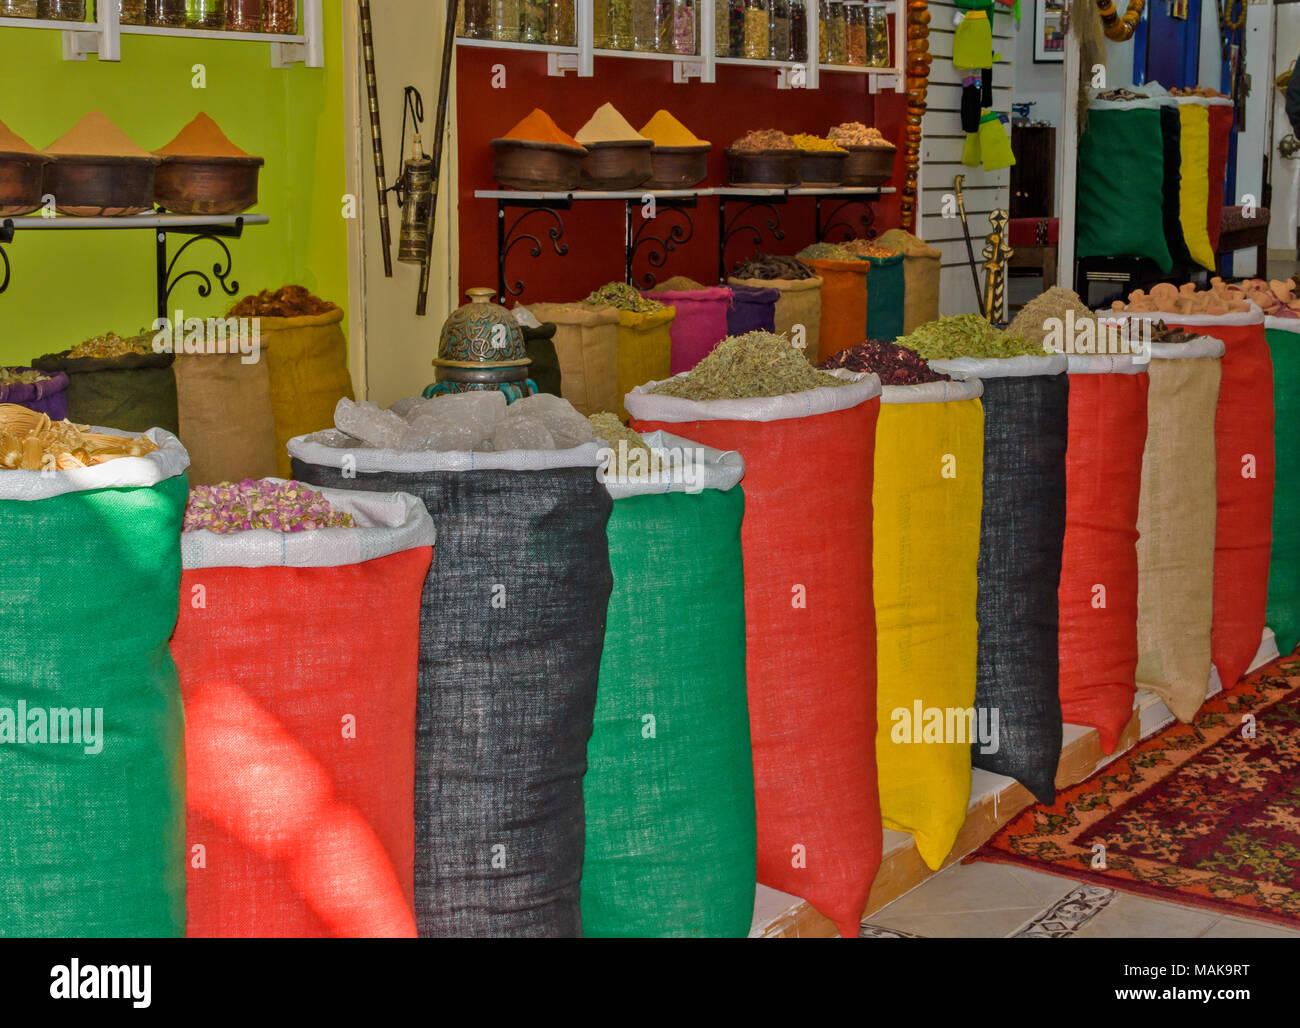 MOROCCO MARRAKECH JEMAA EL FNA MEDINA SOUK ASSORTMENT OF SPICES IN COLOURED SACKS FOR SALE - Stock Image